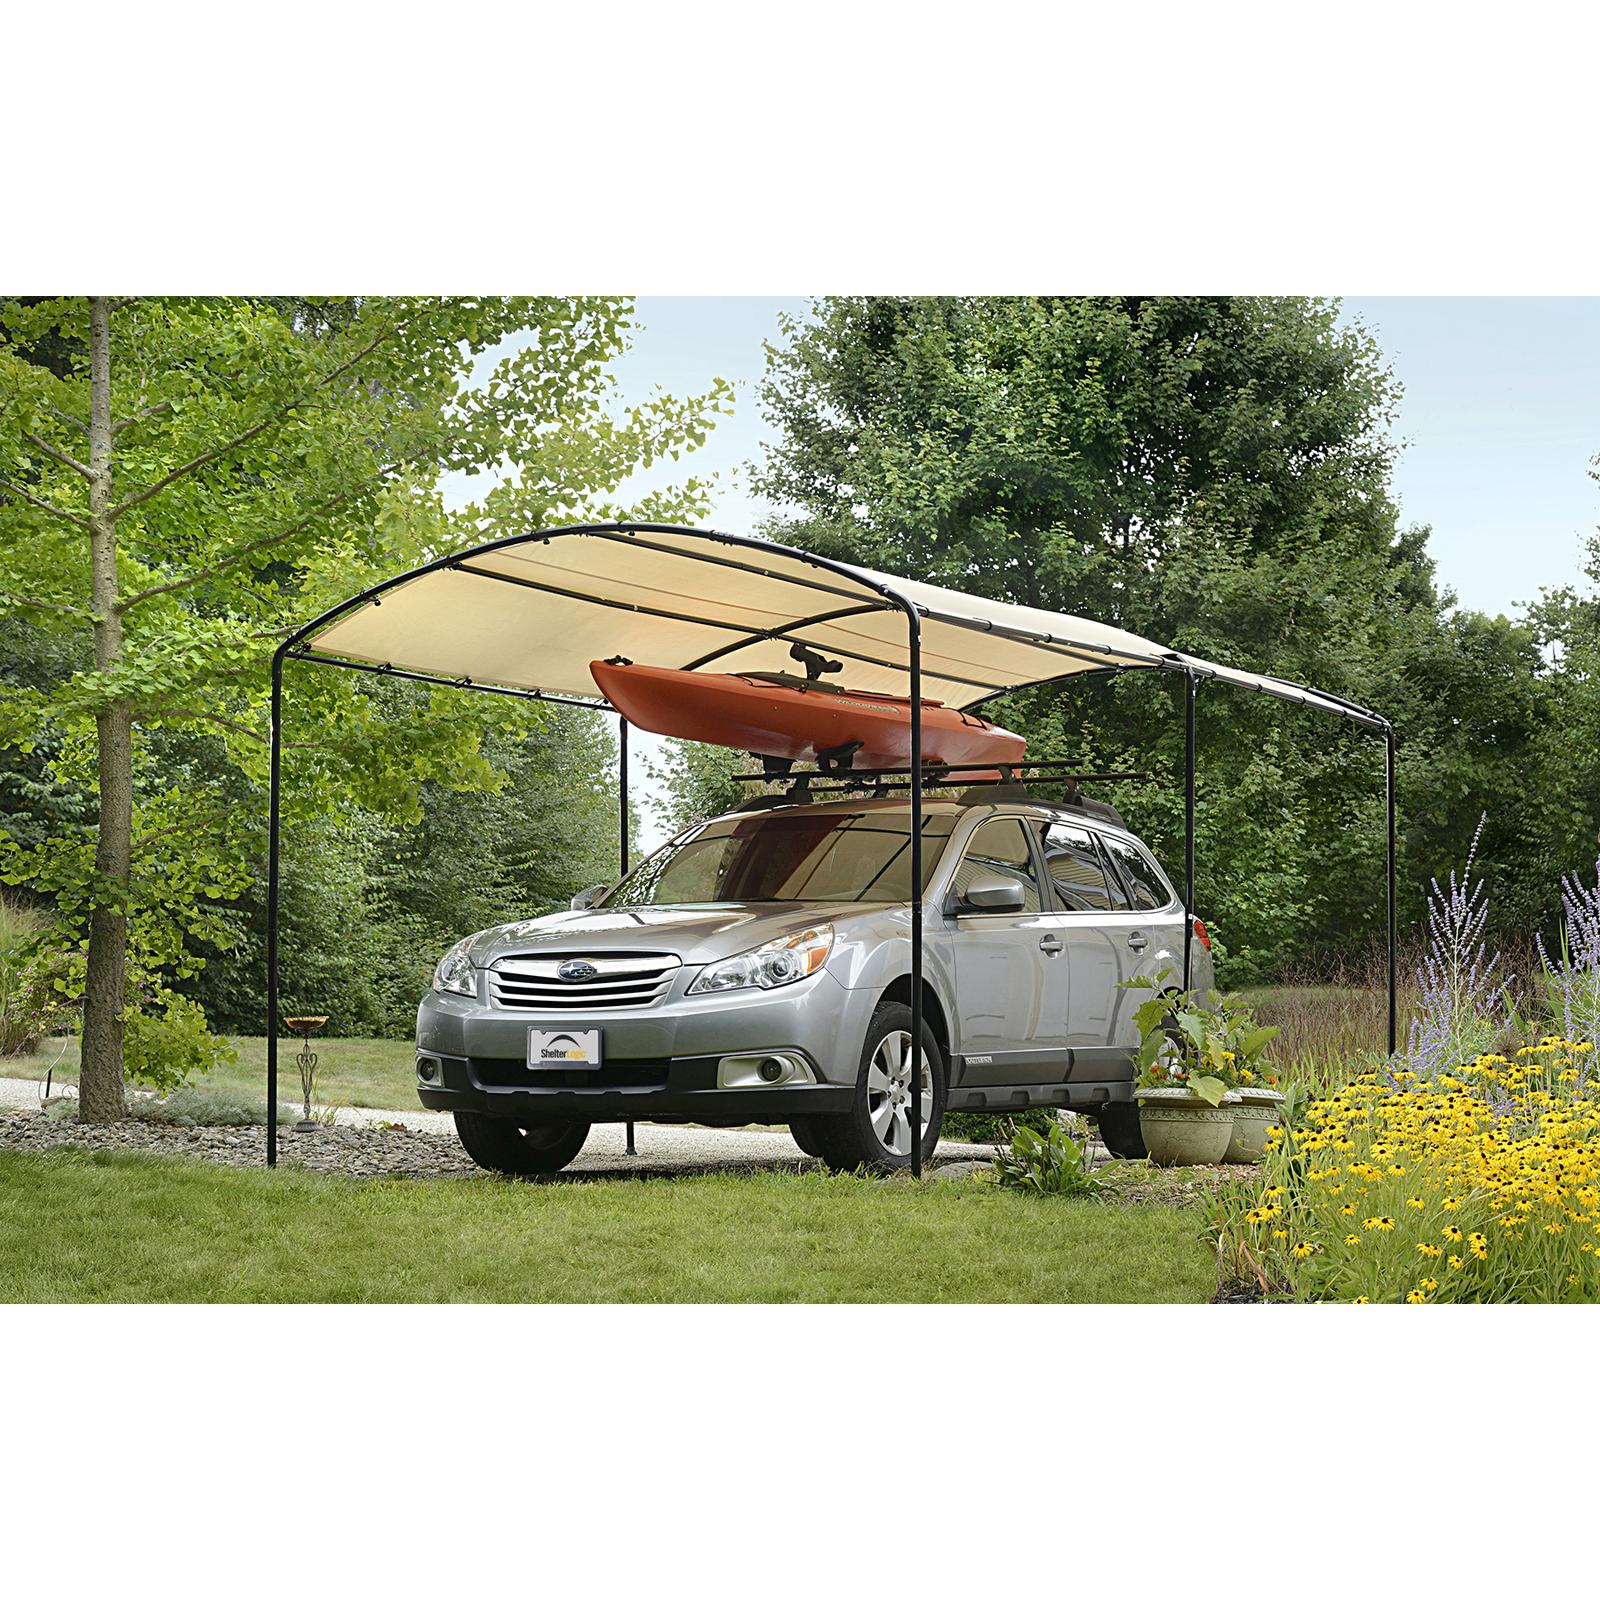 shelterlogic monarc car canopy LDOBRGH